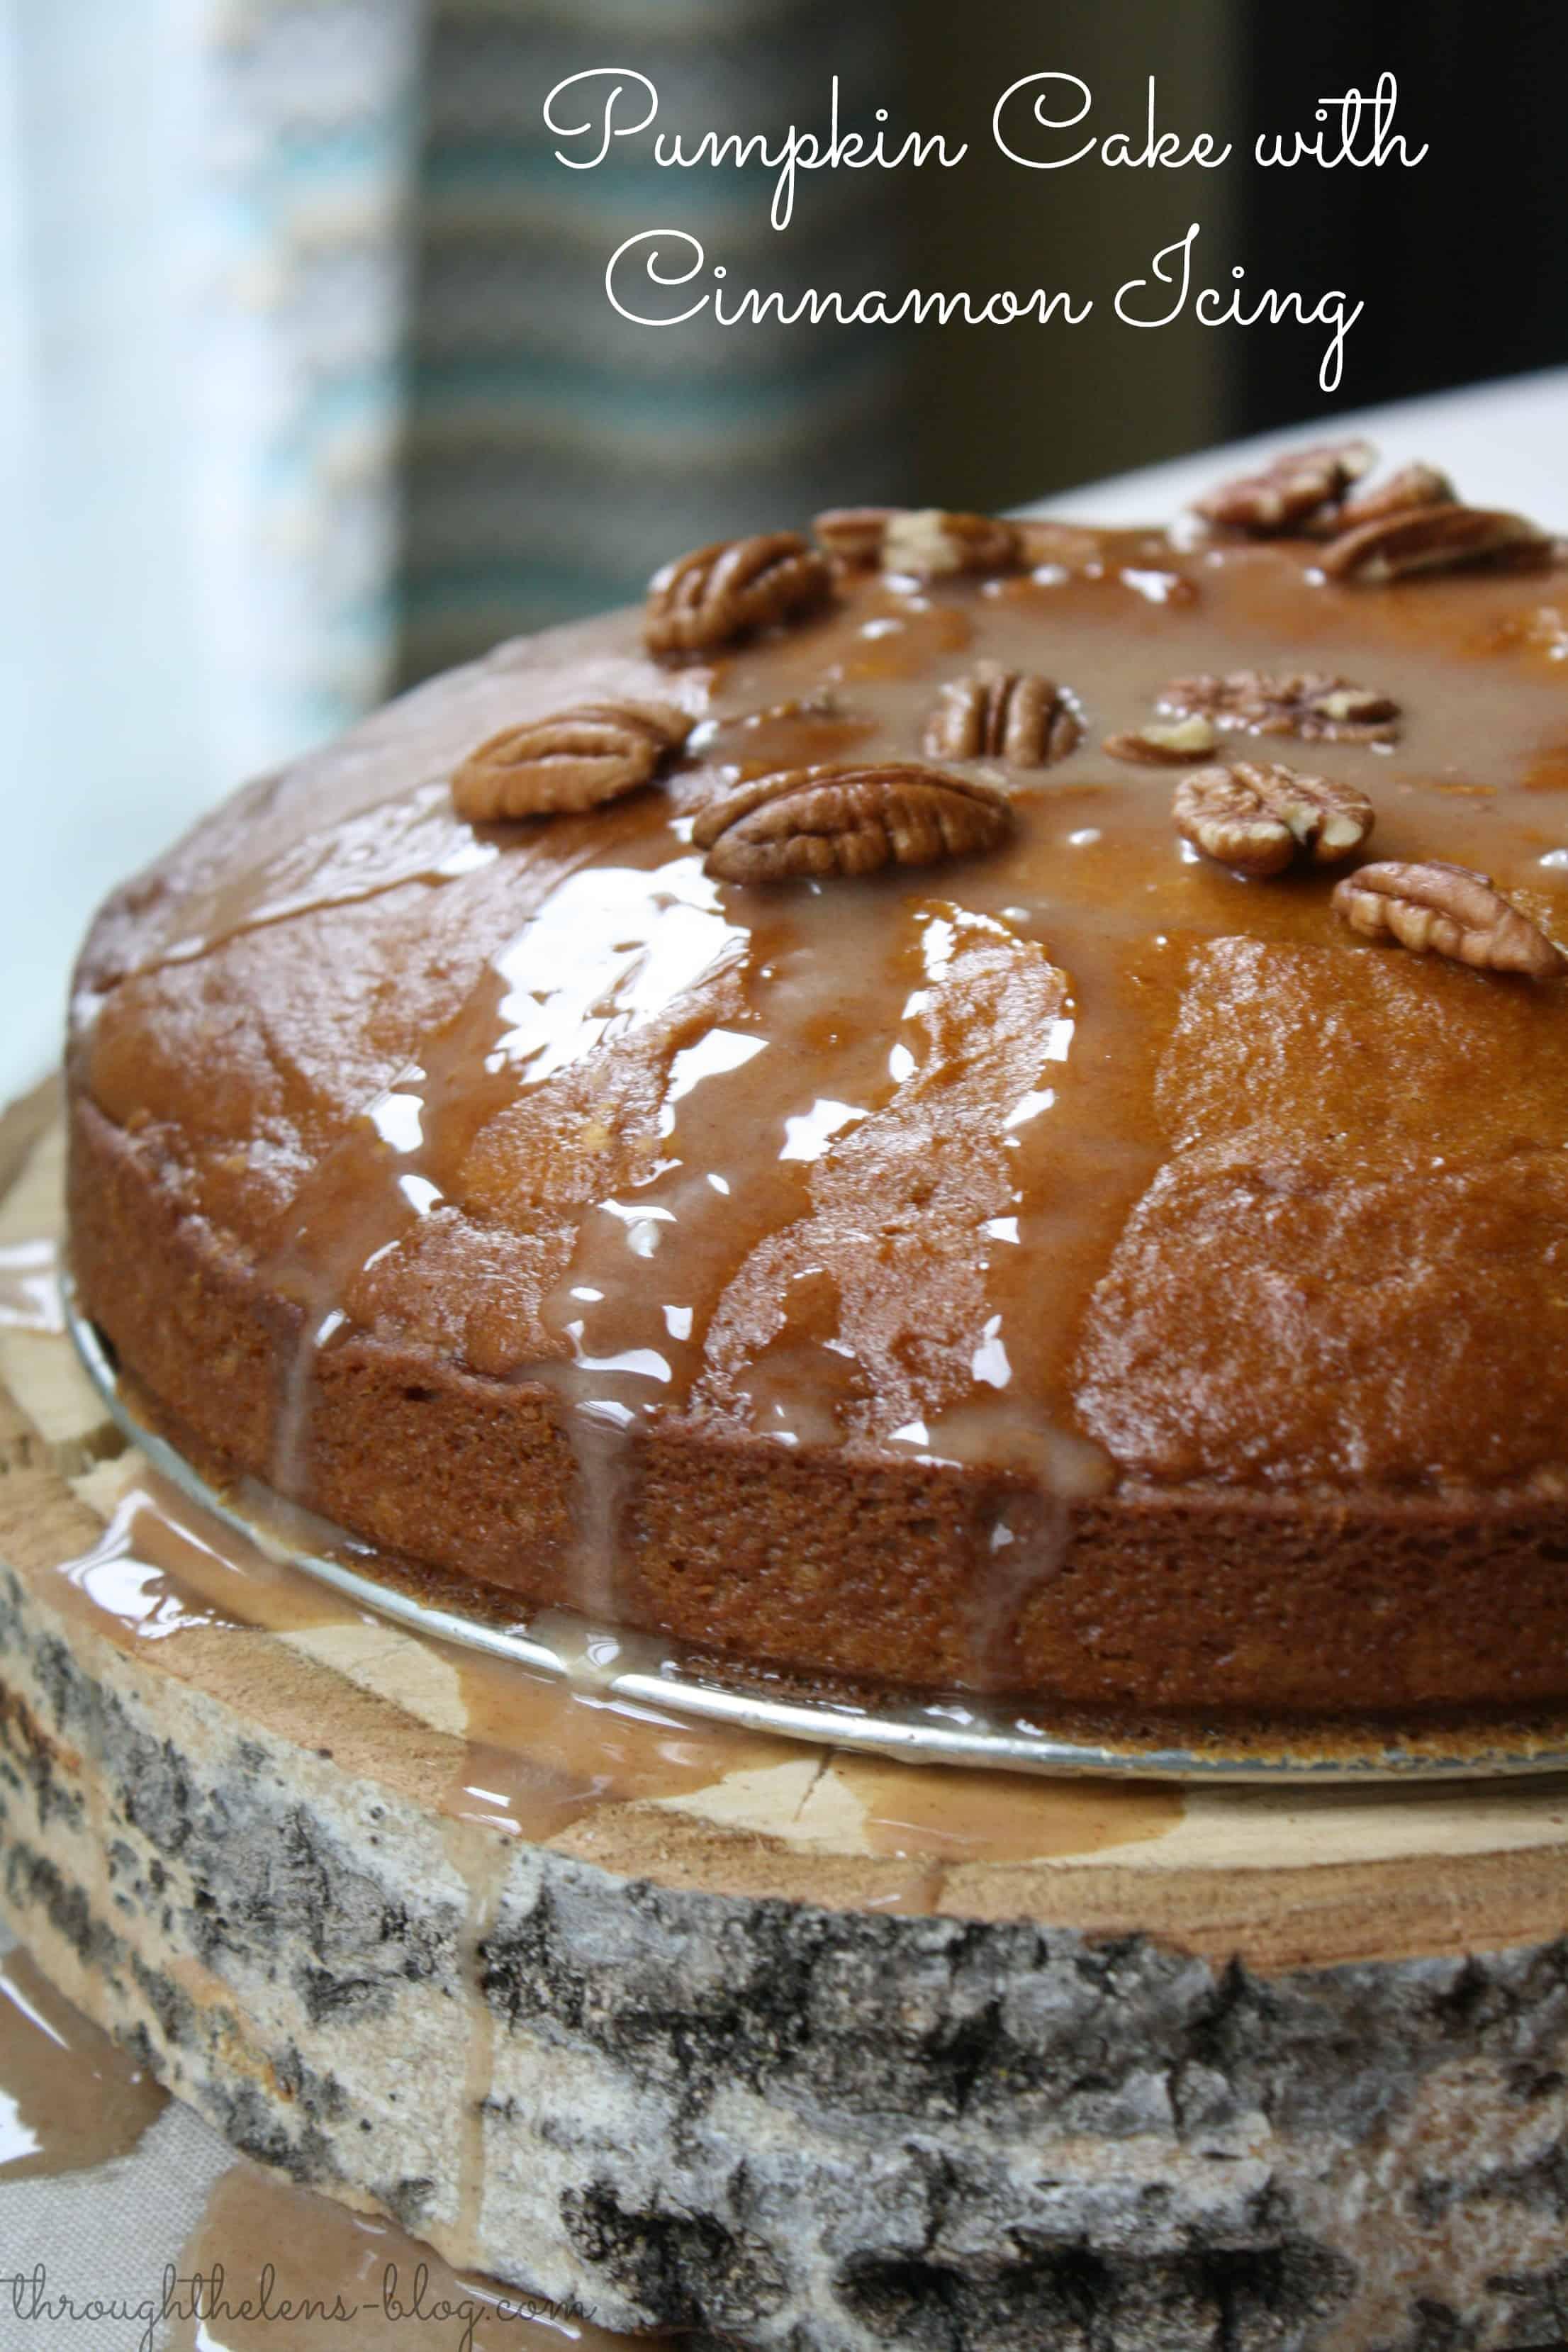 Pumpkin Cake with Cinnamon Icing